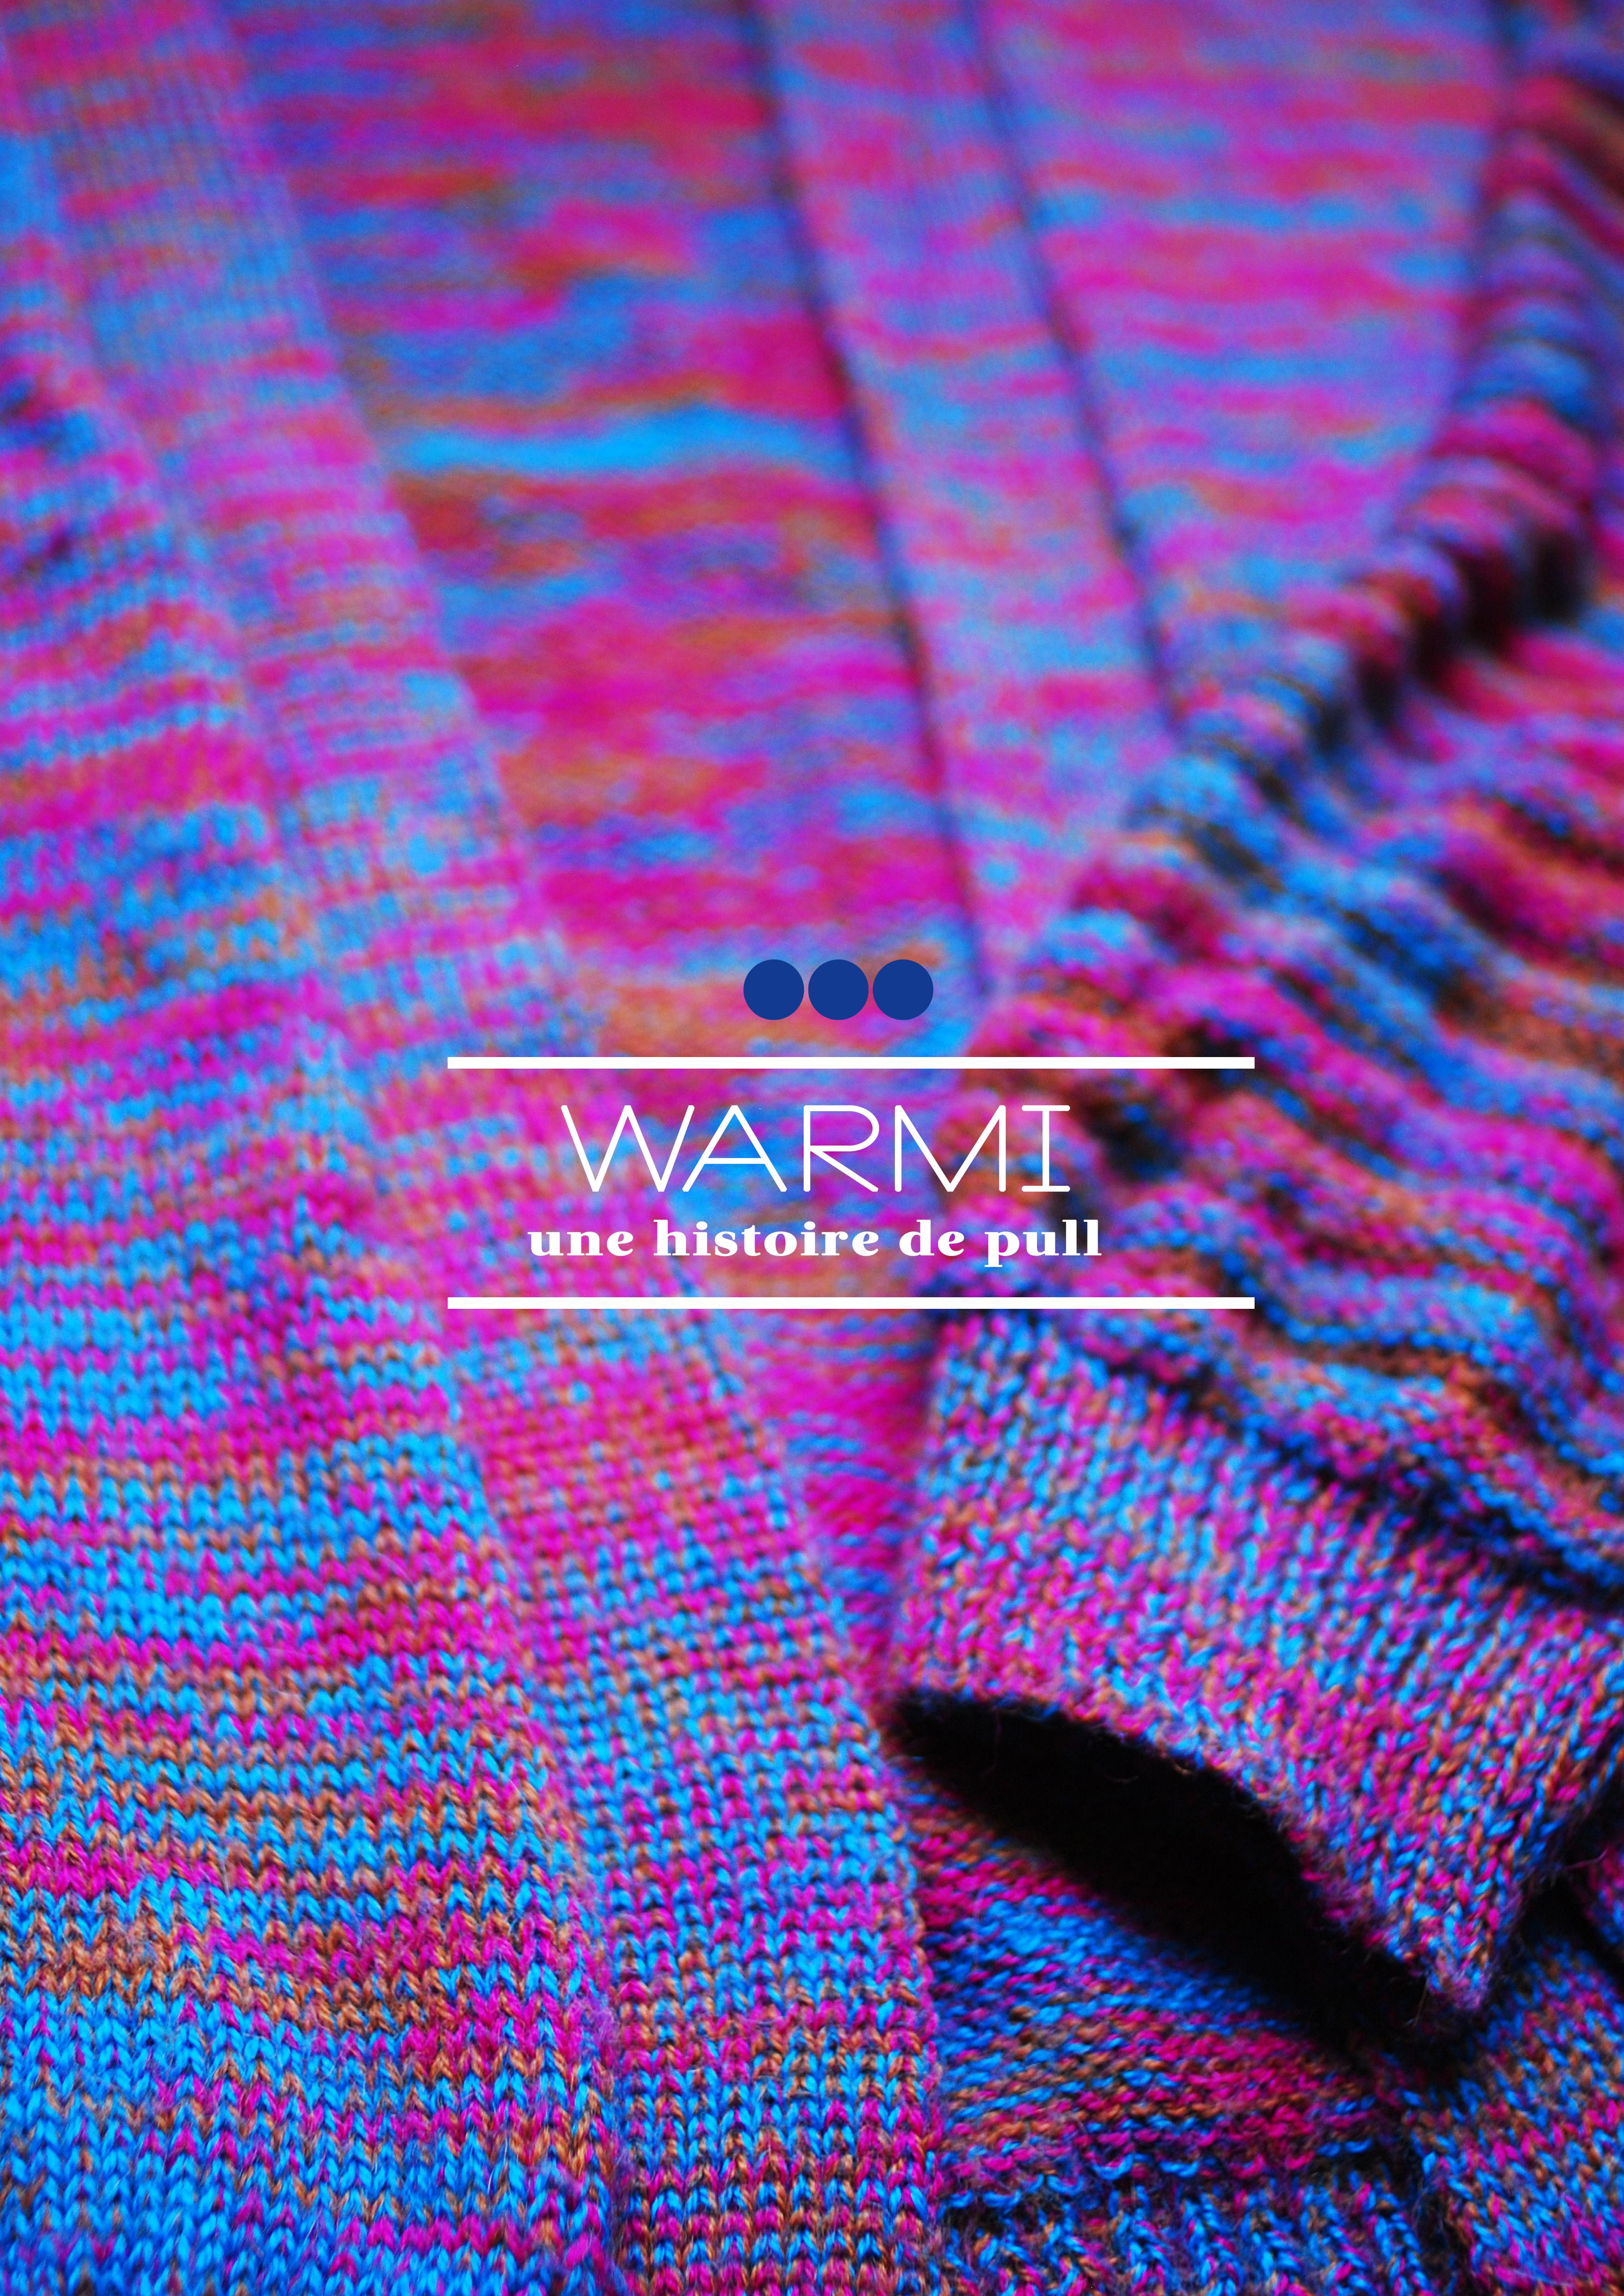 warmi-pull-visuel-by-le-polyedre_1